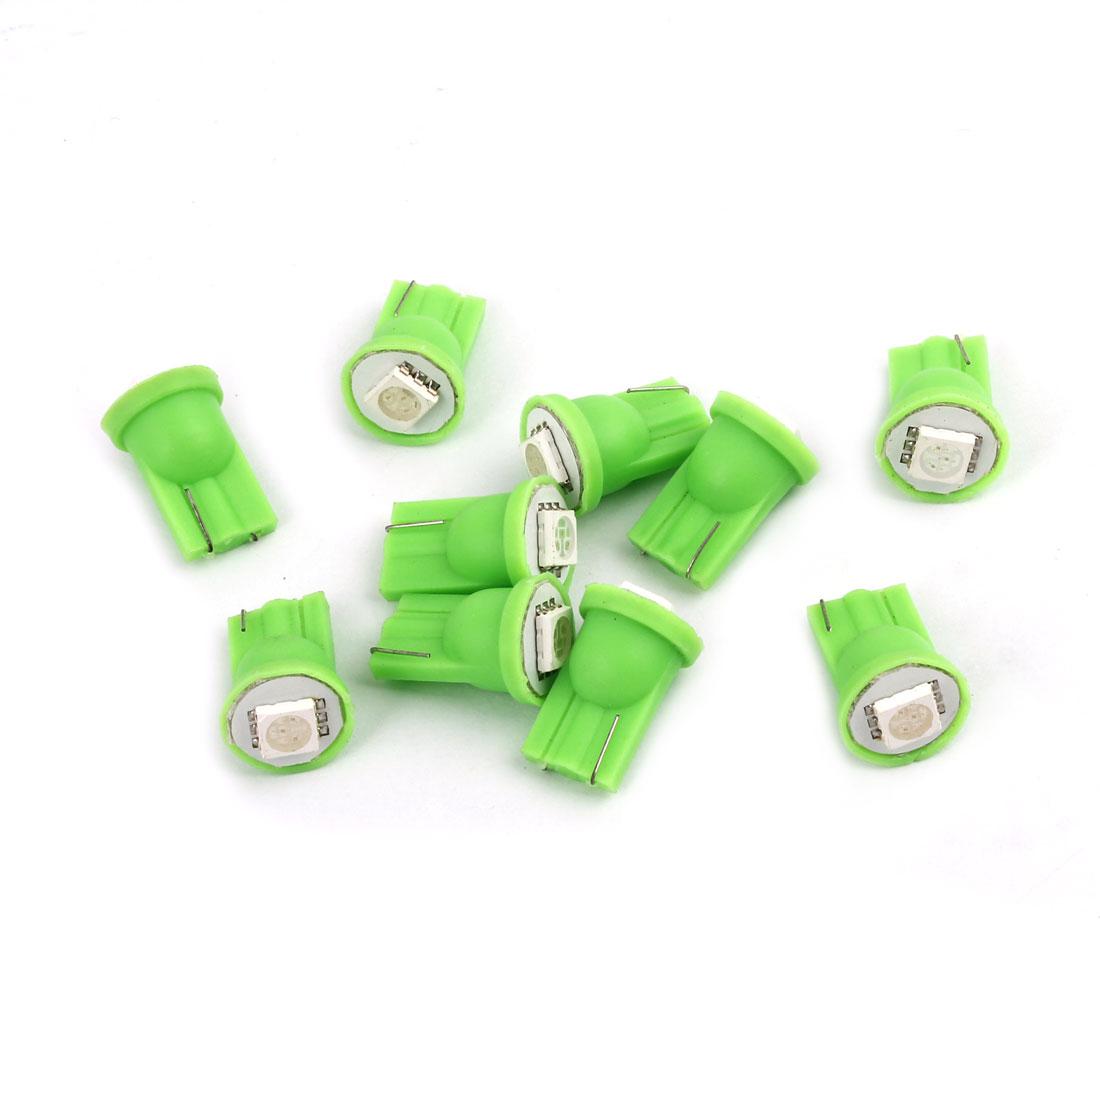 10 Pcs Vehicle T10 Green 5050 SMD LED Turning Signal Light Dash Bulbs Internal